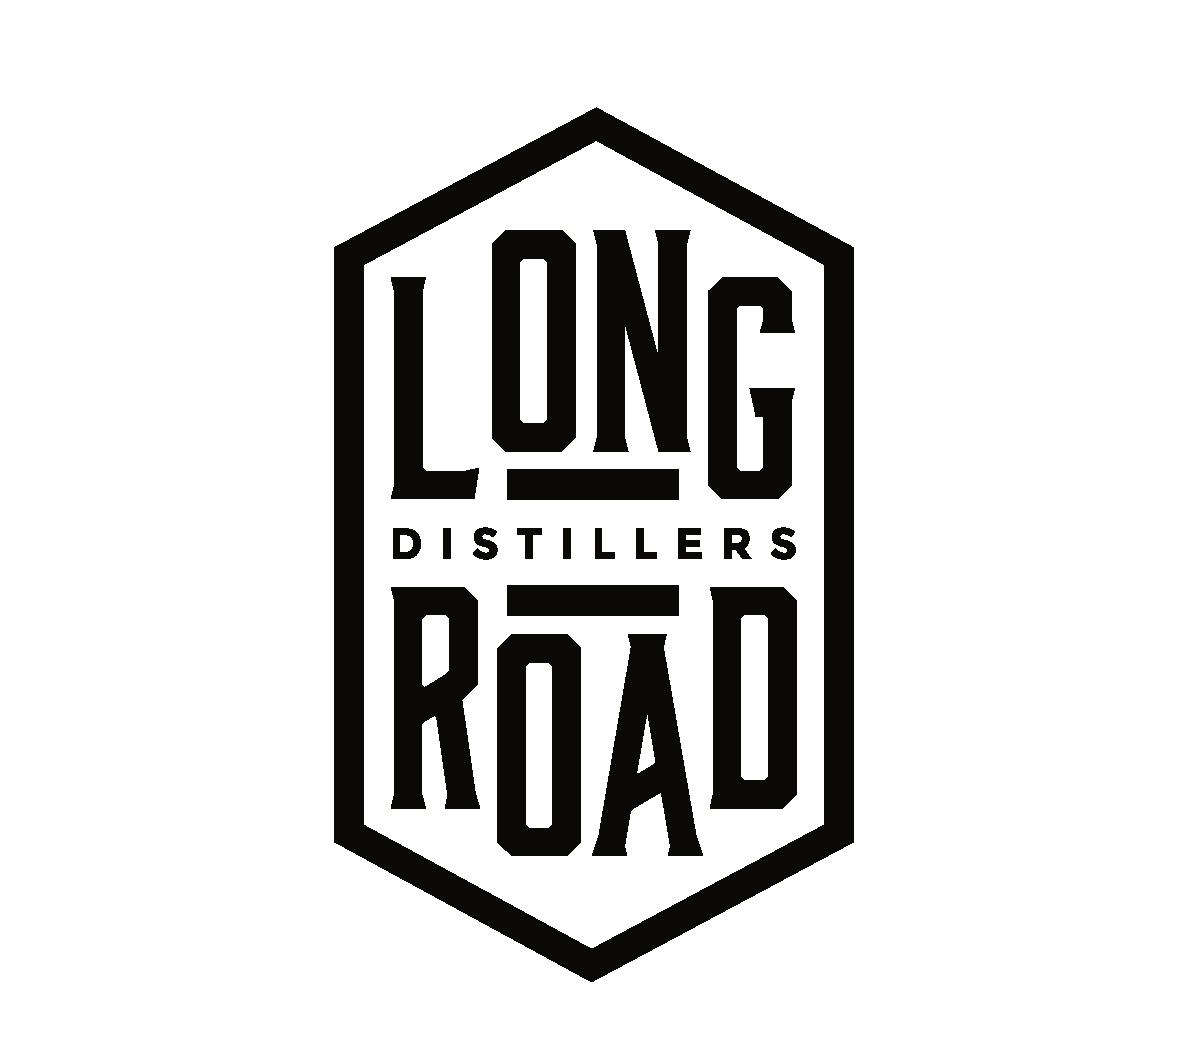 Long Road_logo_black on white.png